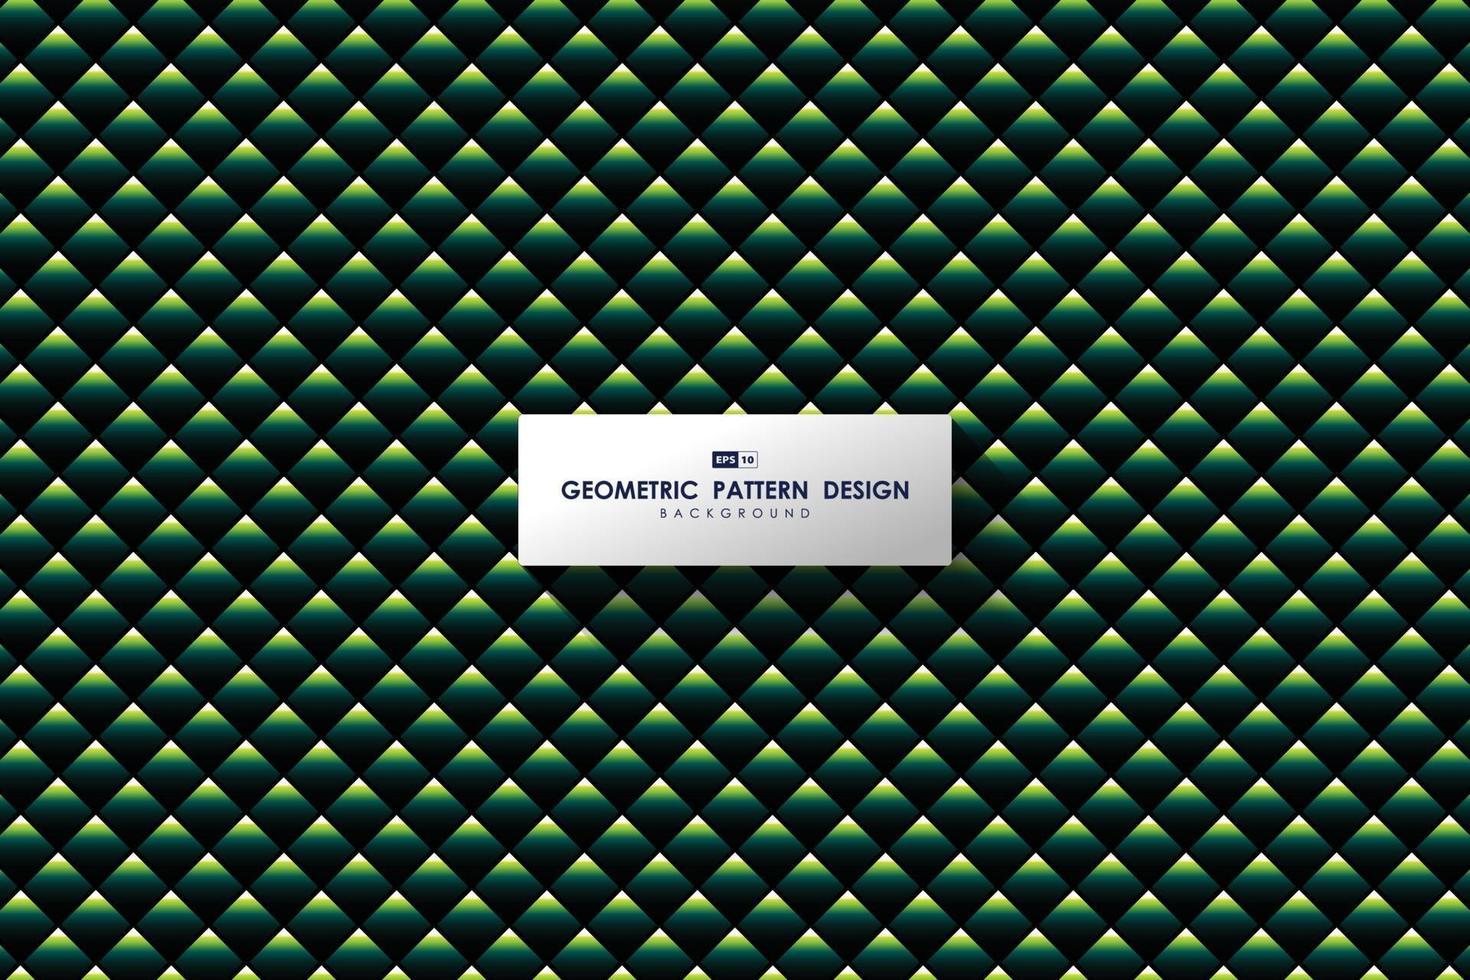 abstraktes grünes Dreiecksmusterdesign des modernen Kunstwerkshintergrundes. Illustrationsvektor eps10 vektor